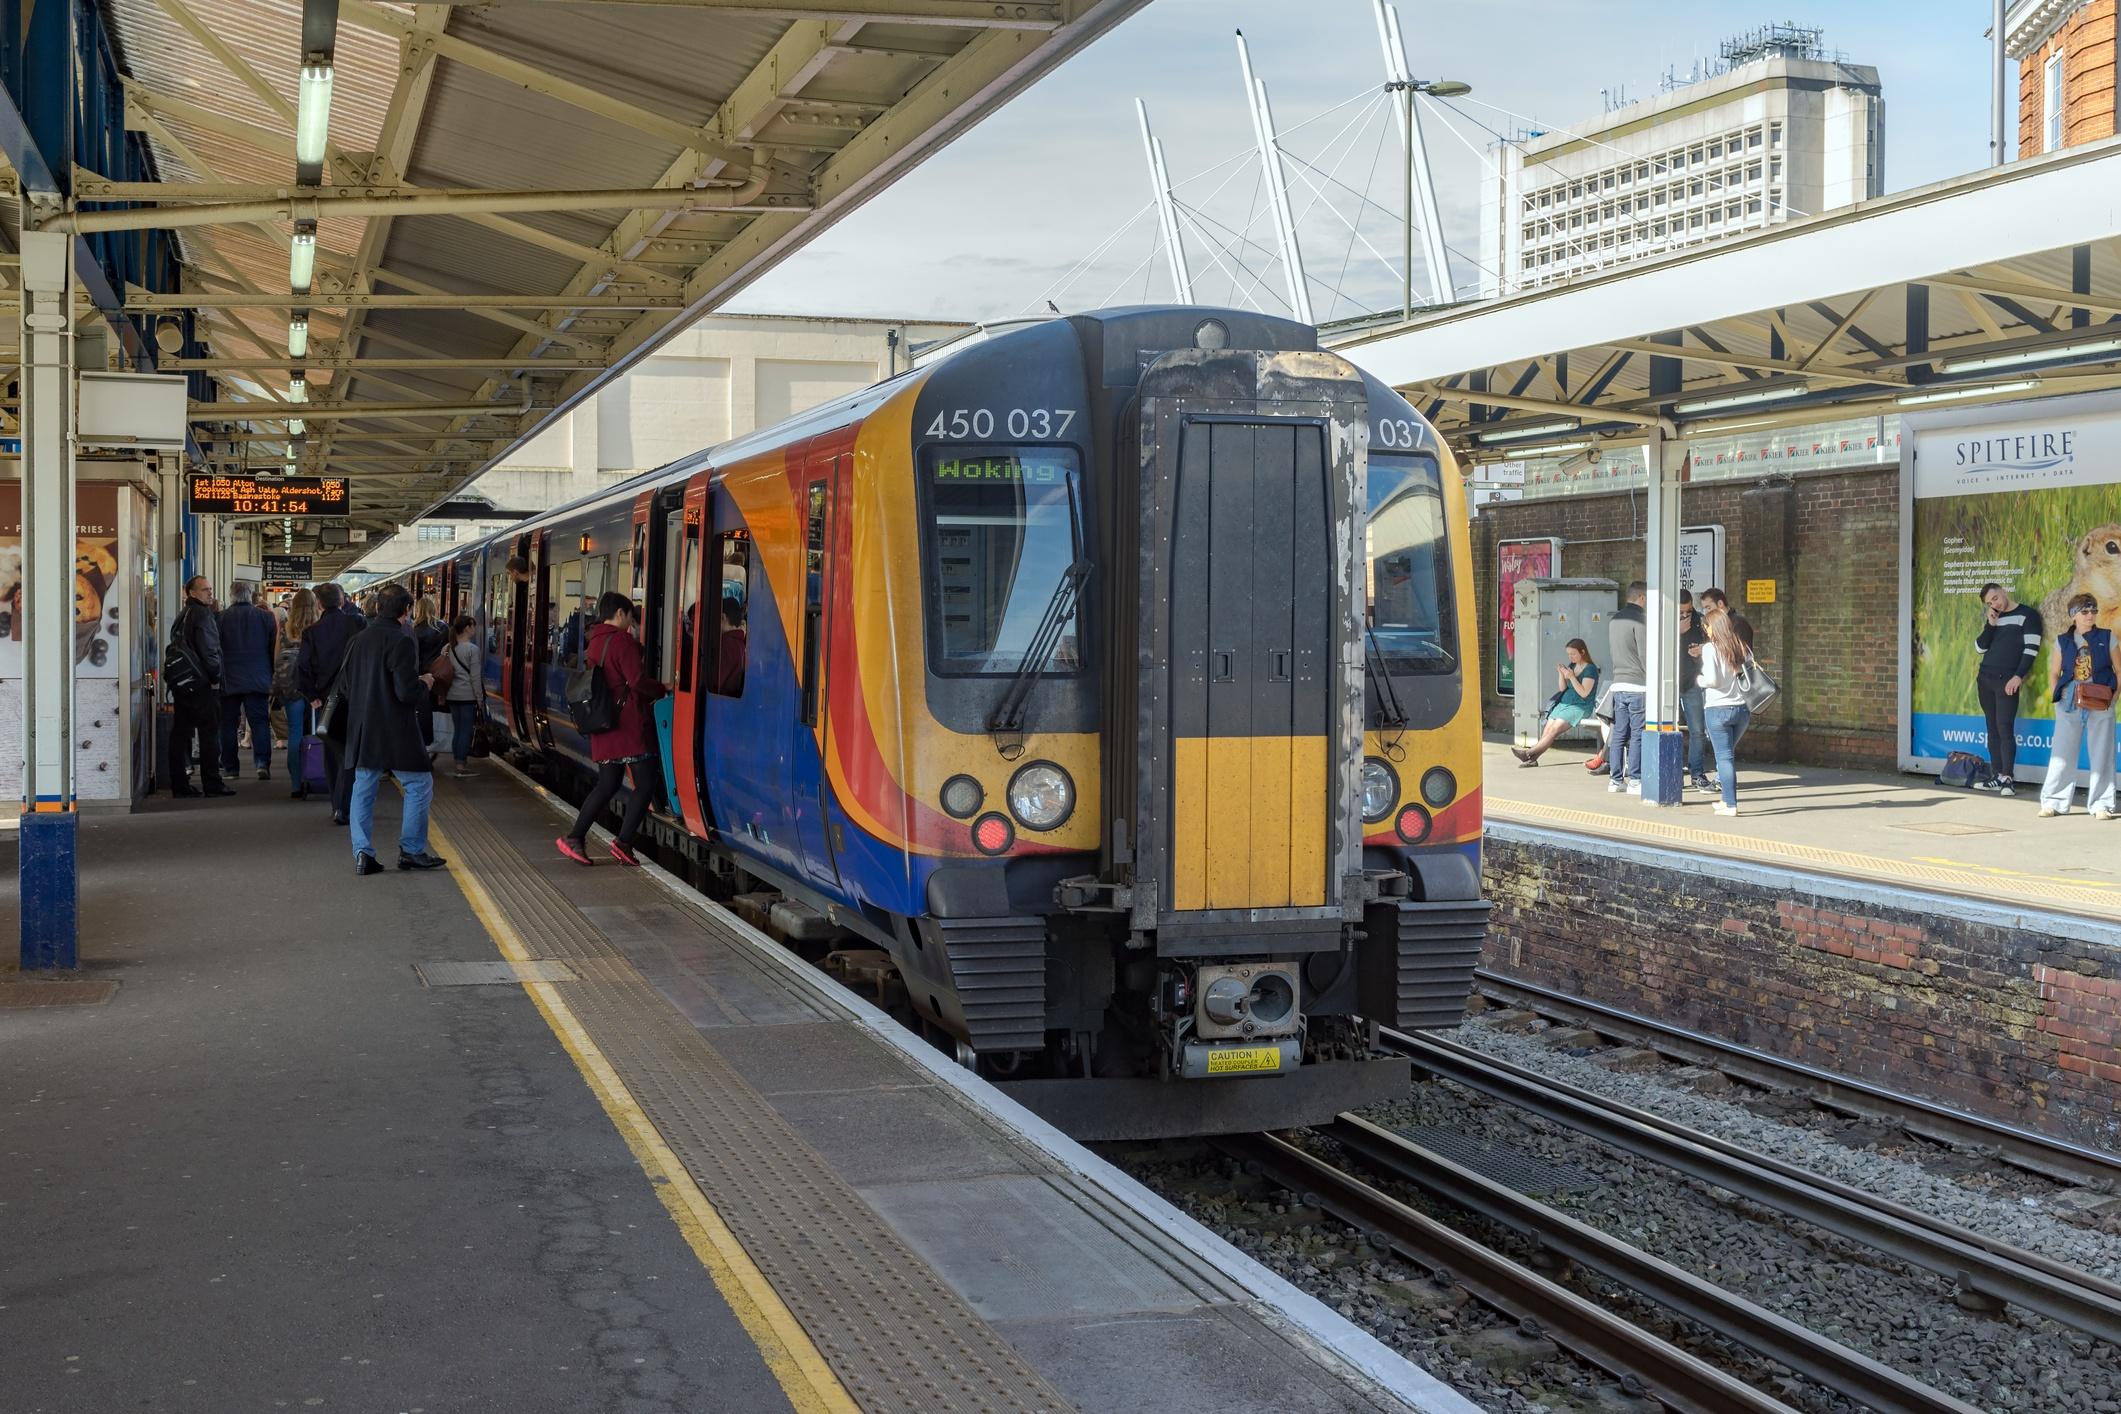 Londong South Western Railway train